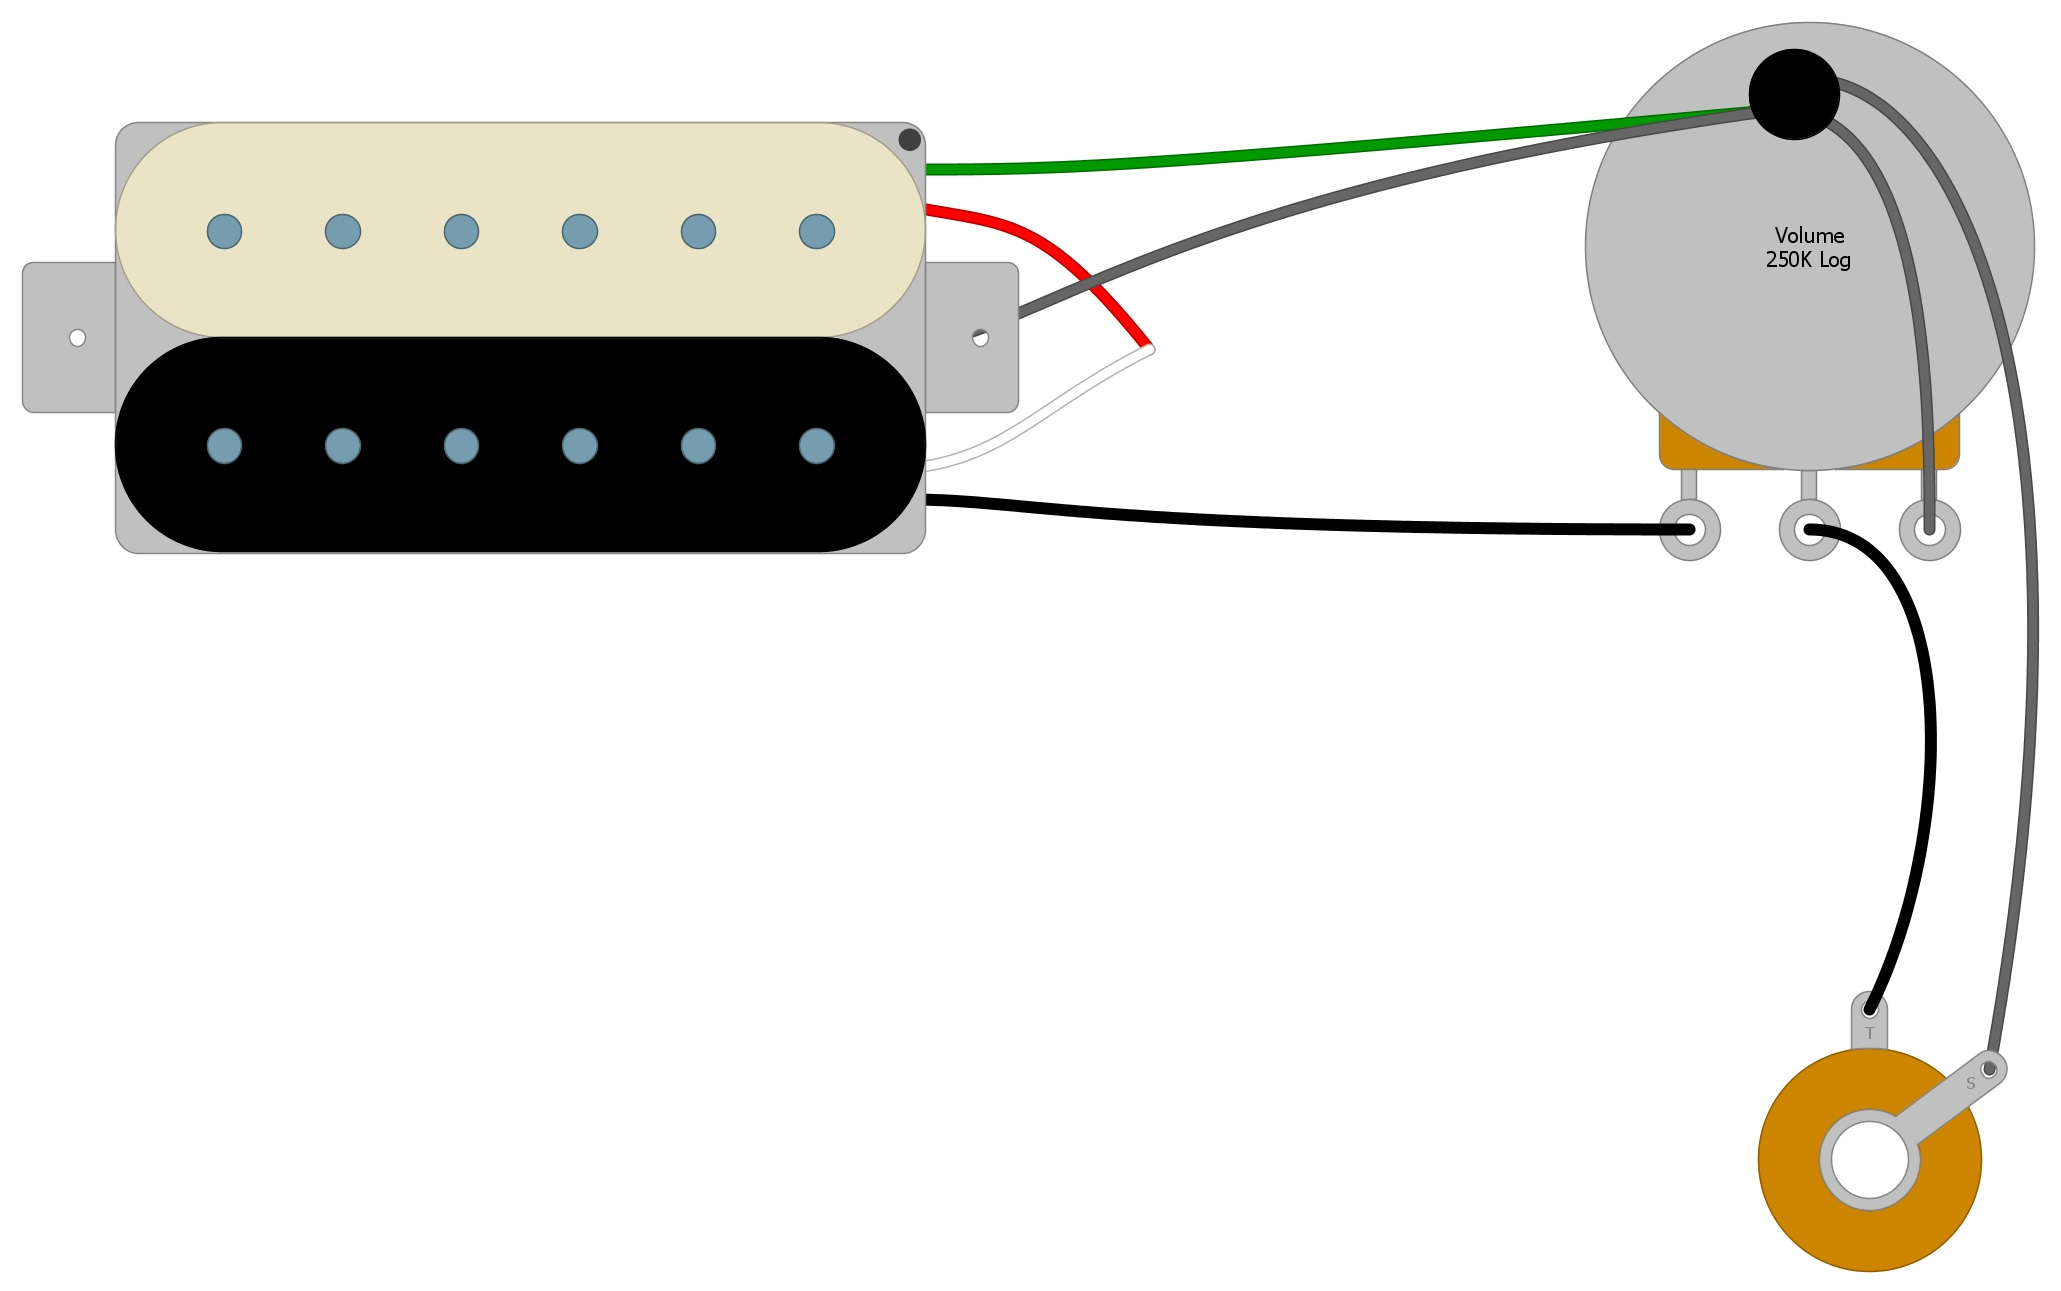 Seymour Duncan SH-4 JB Wiring Diagram – Humbucker Soup | Adding Wiring Diagram Seymour Duncan Humbucker Strat |  | Humbucker Soup